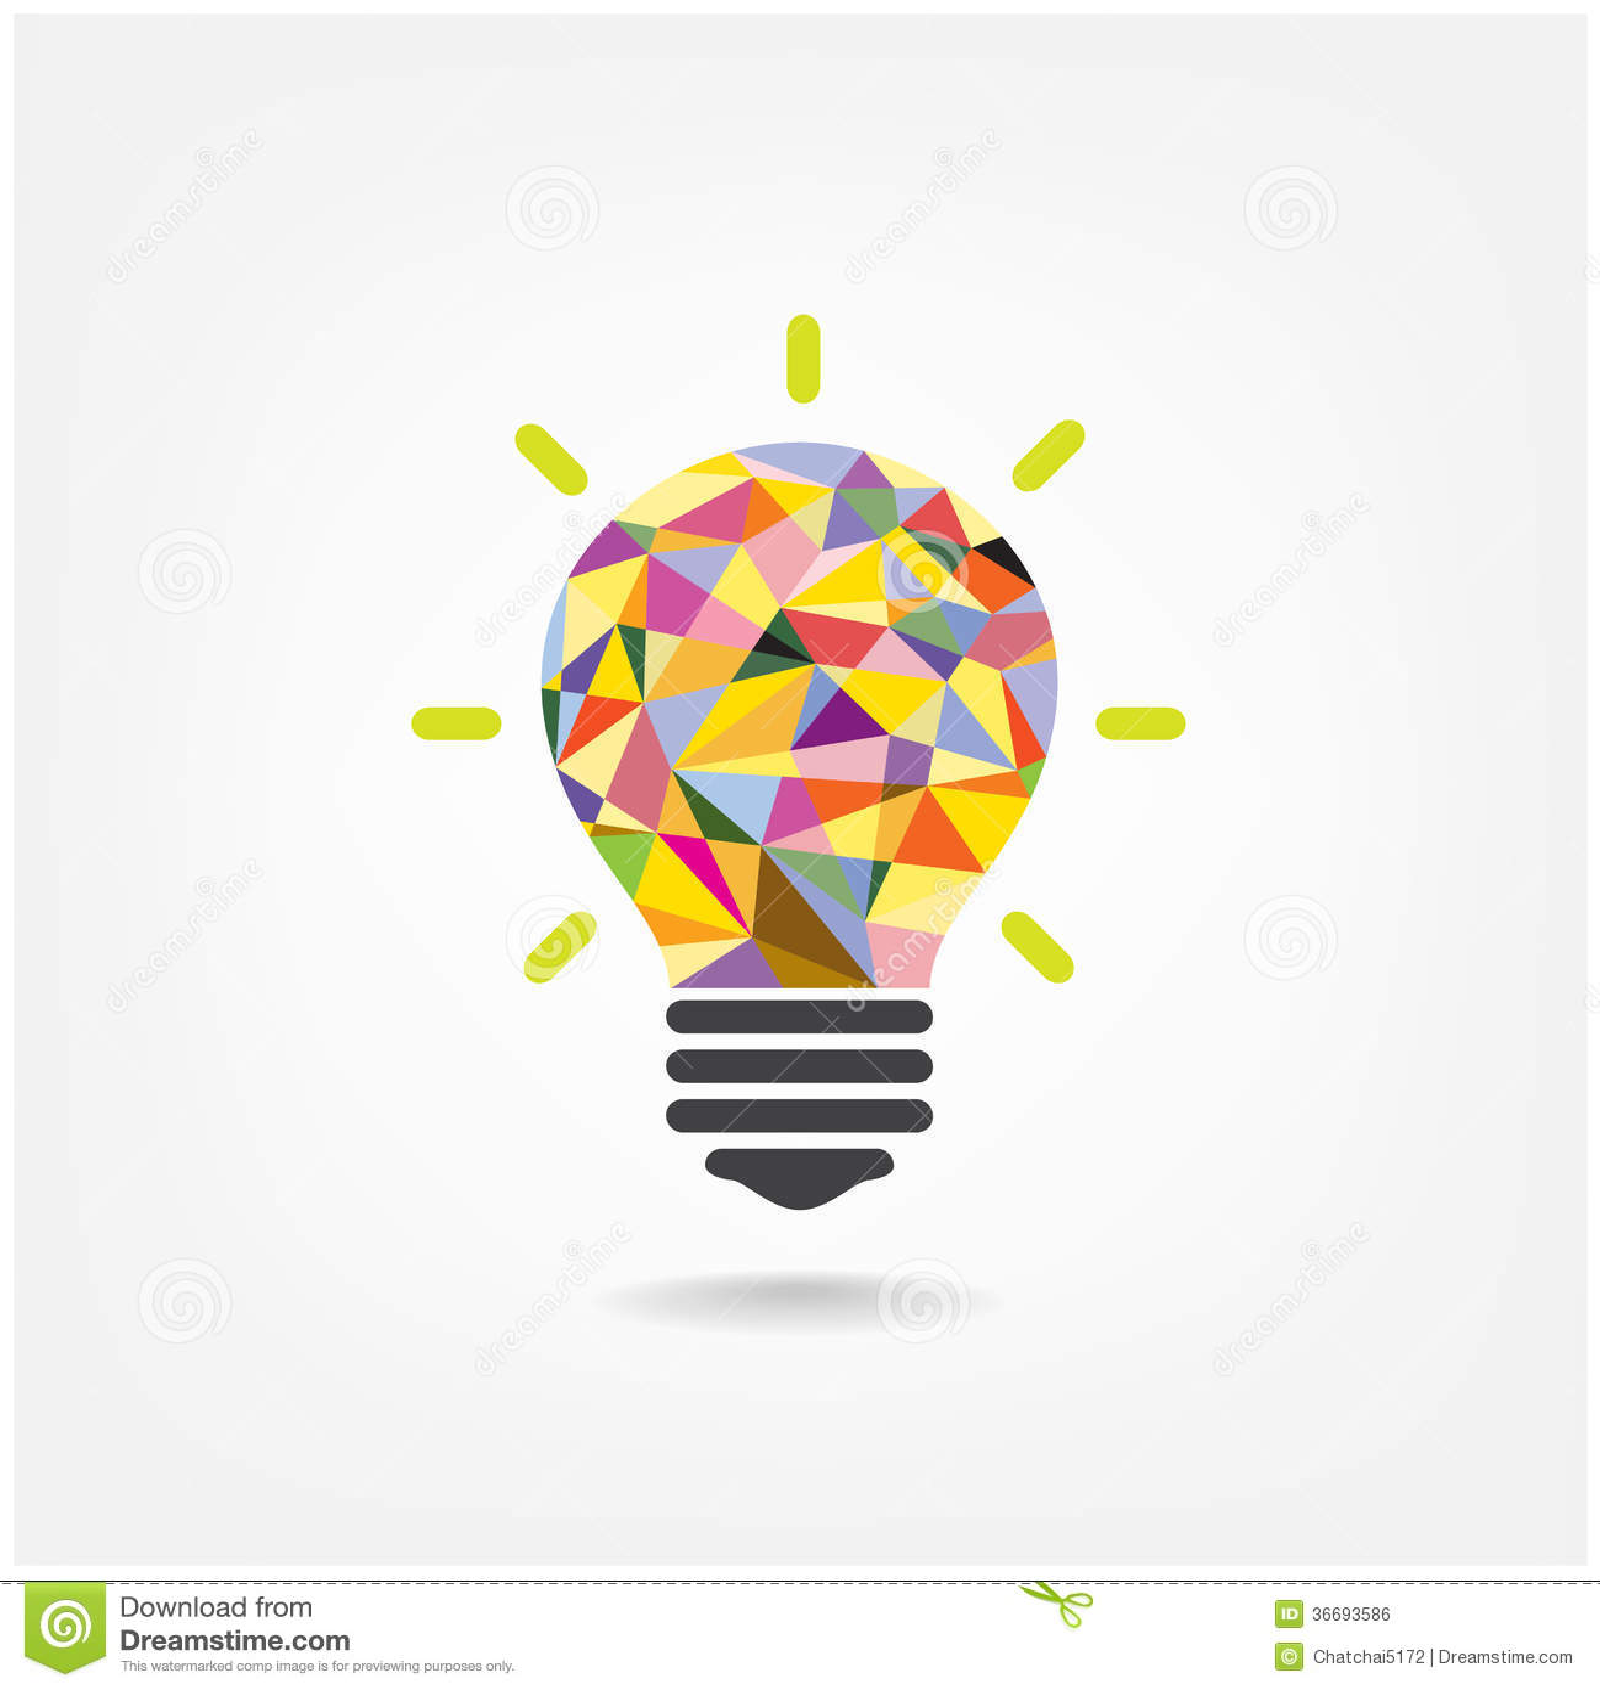 10 Ways to Increase Imagination & Creativity